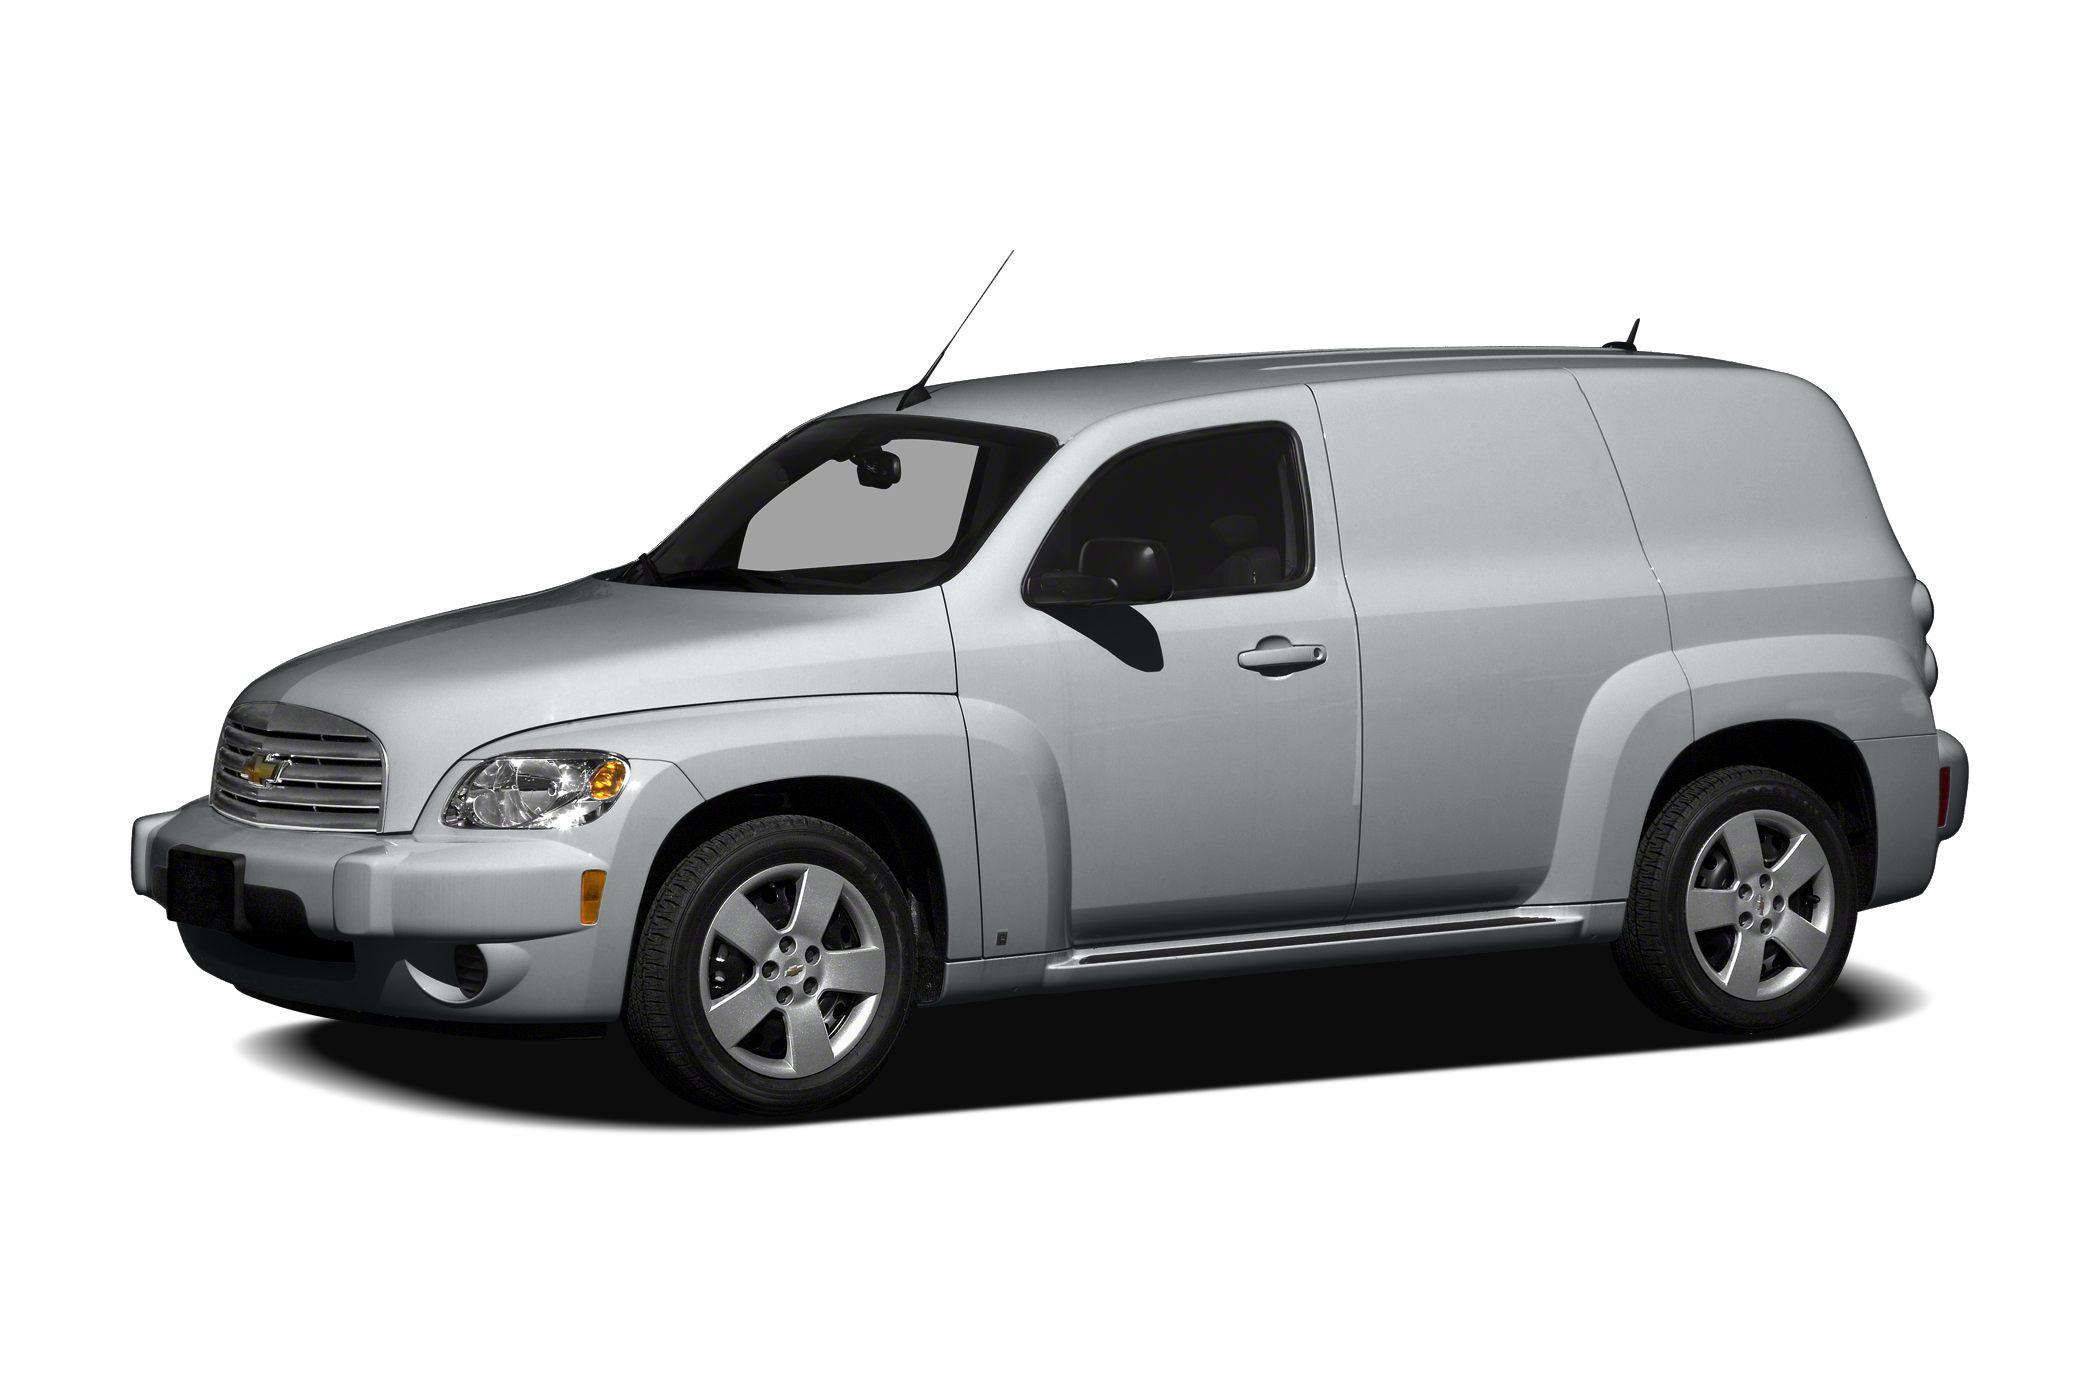 2011 Chevrolet HHR Panel